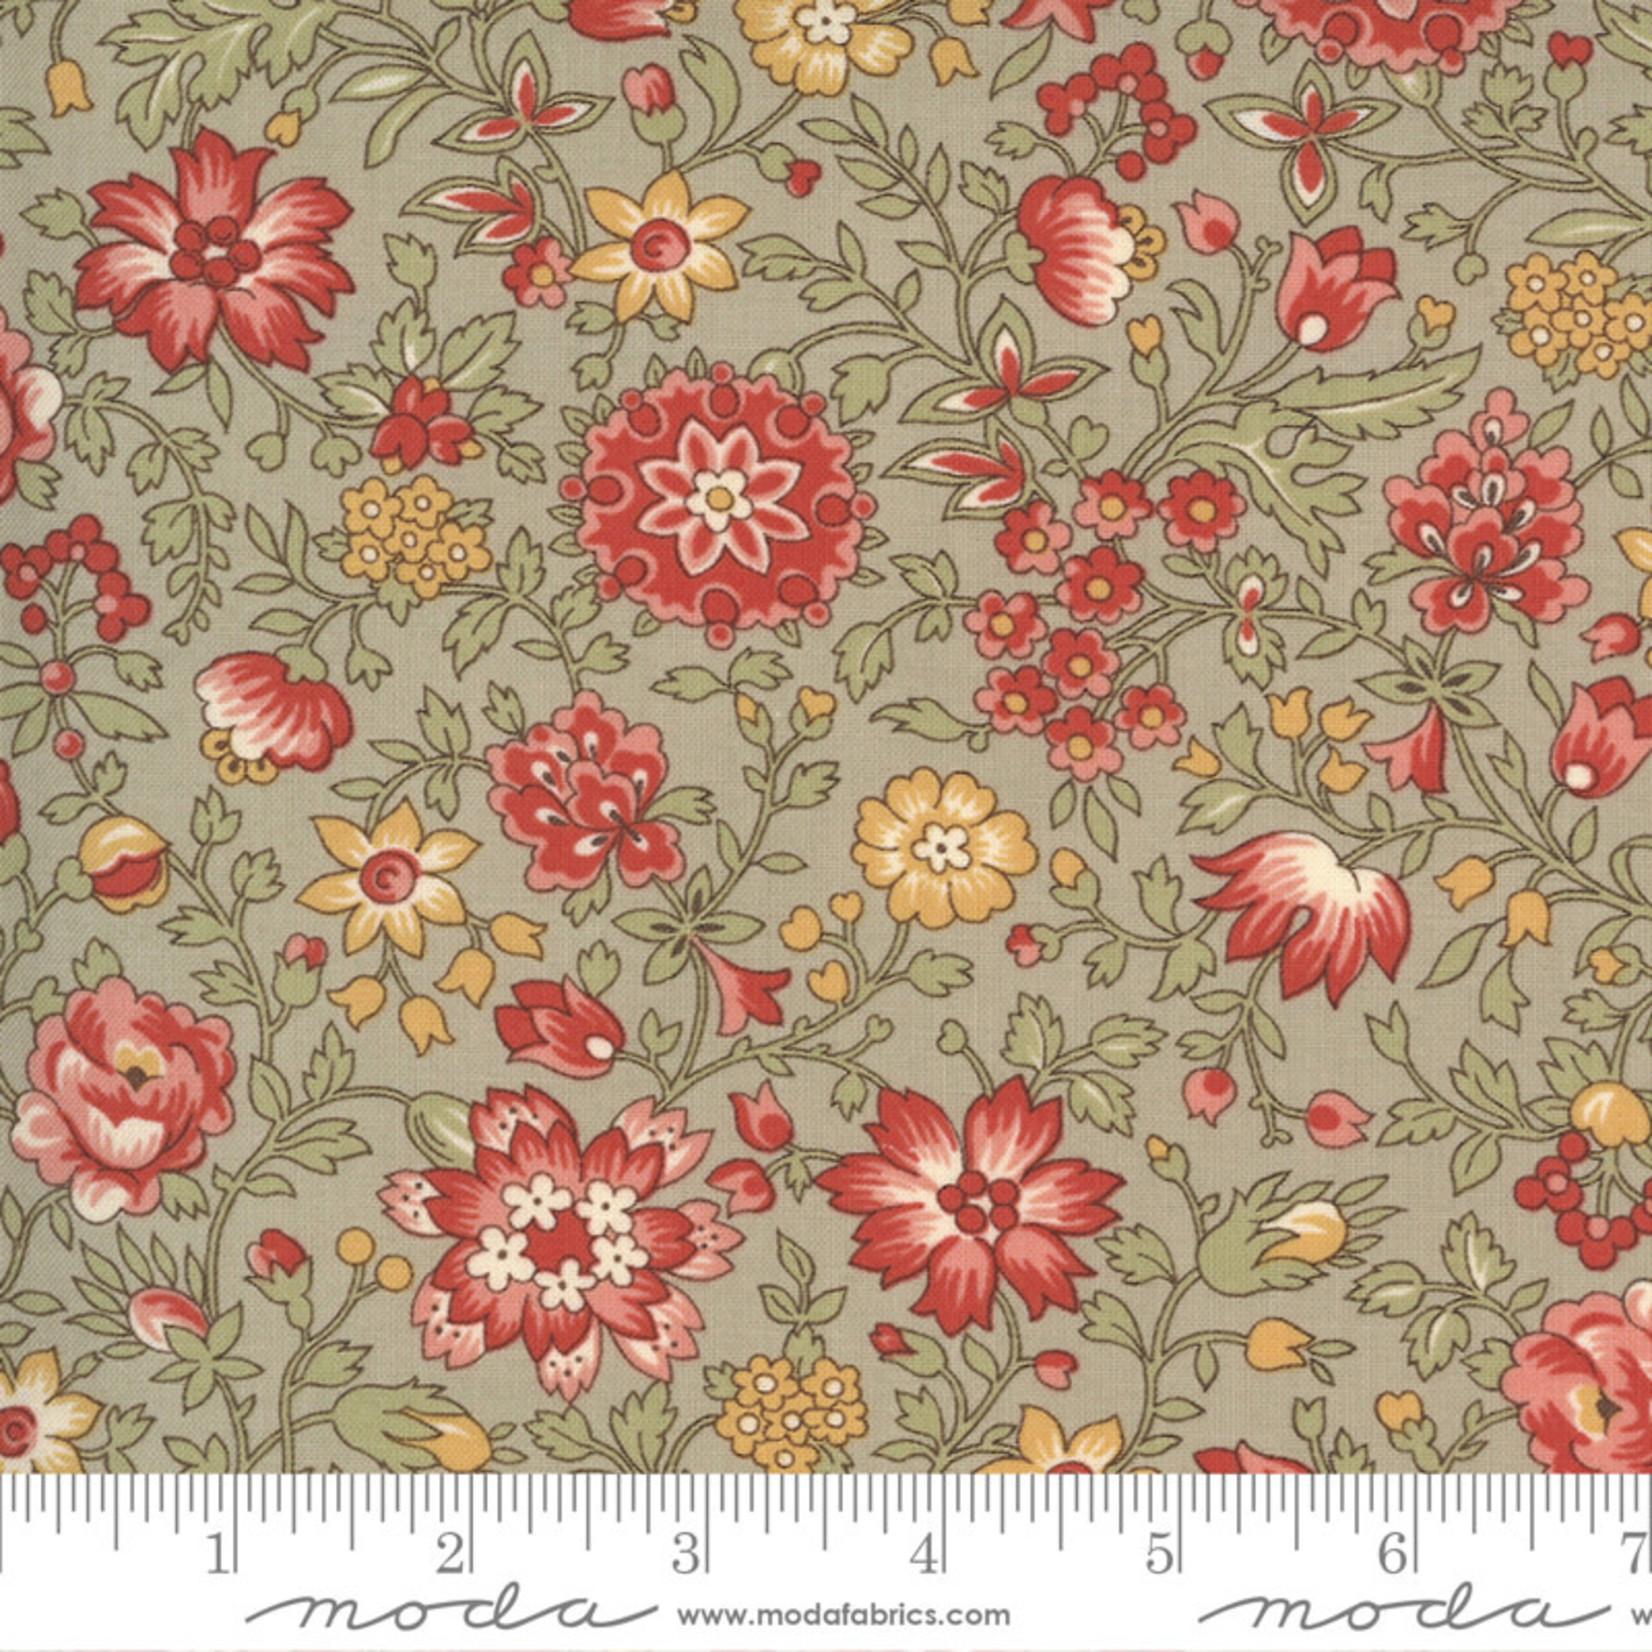 FRENCH GENERAL Jardins De Fleurs, Giverny, Roche 13894-24 $0.20 per cm or $20/m